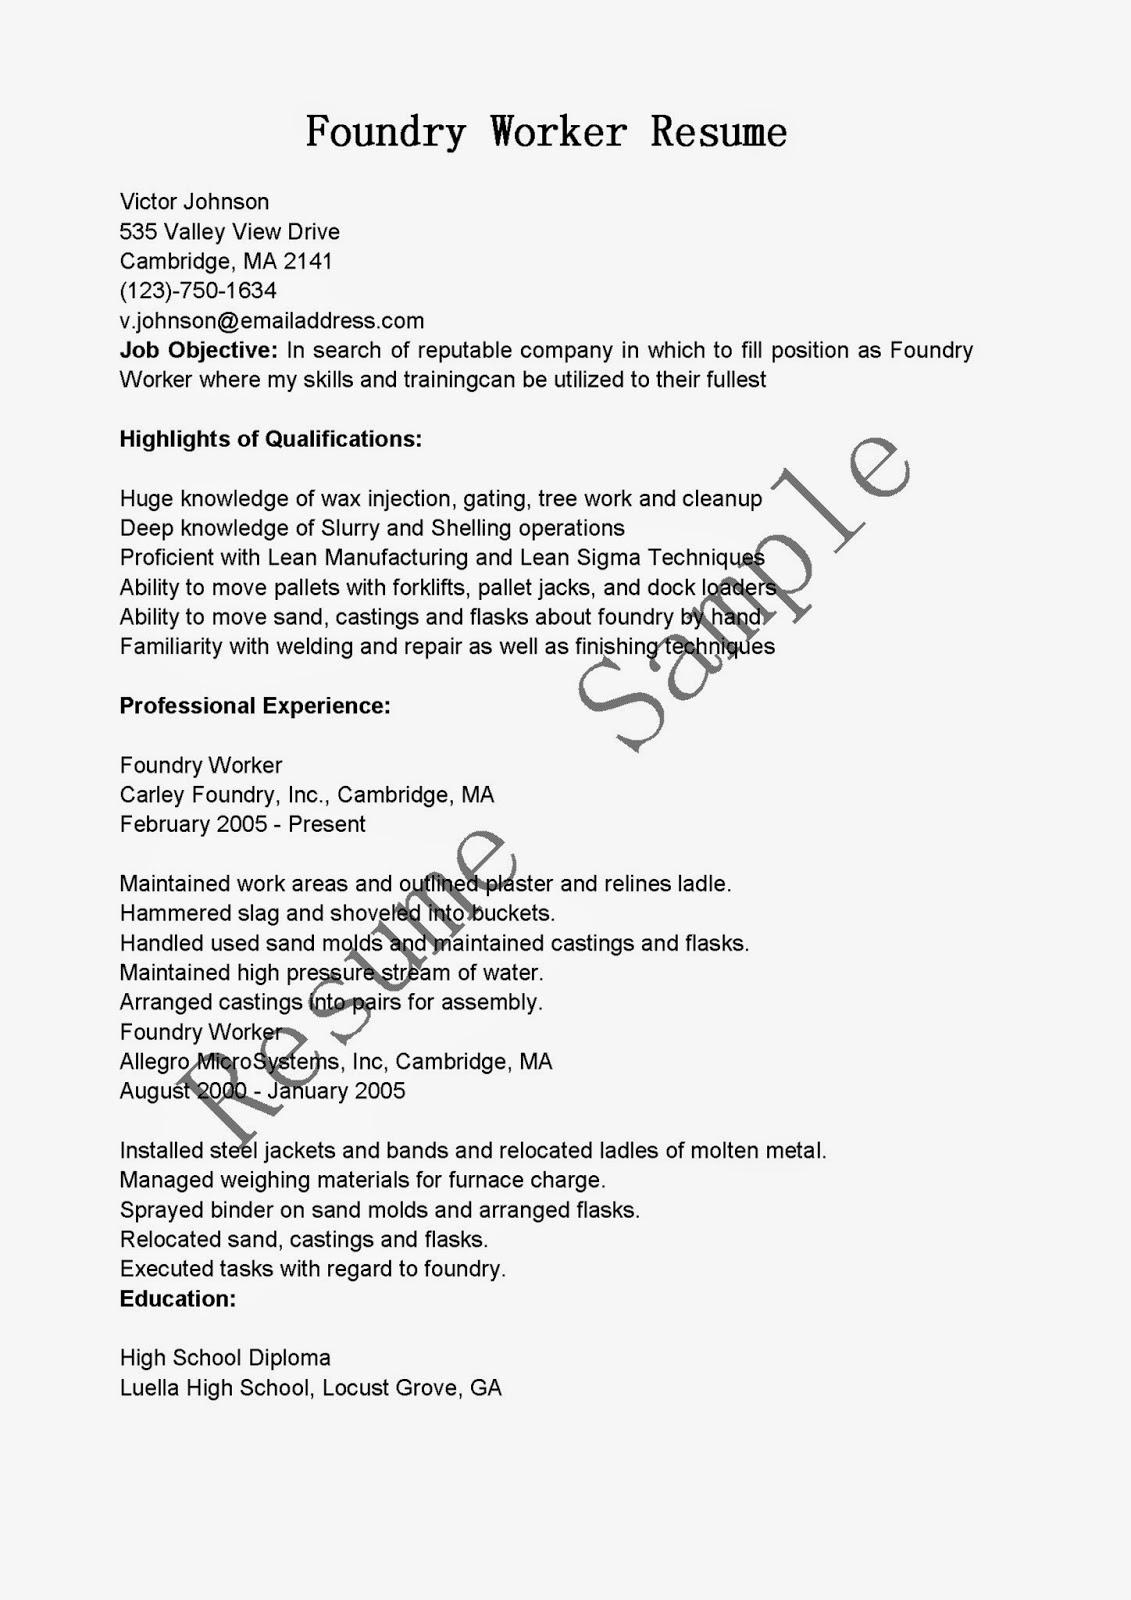 Resume Samples Foundry Worker Resume Sample